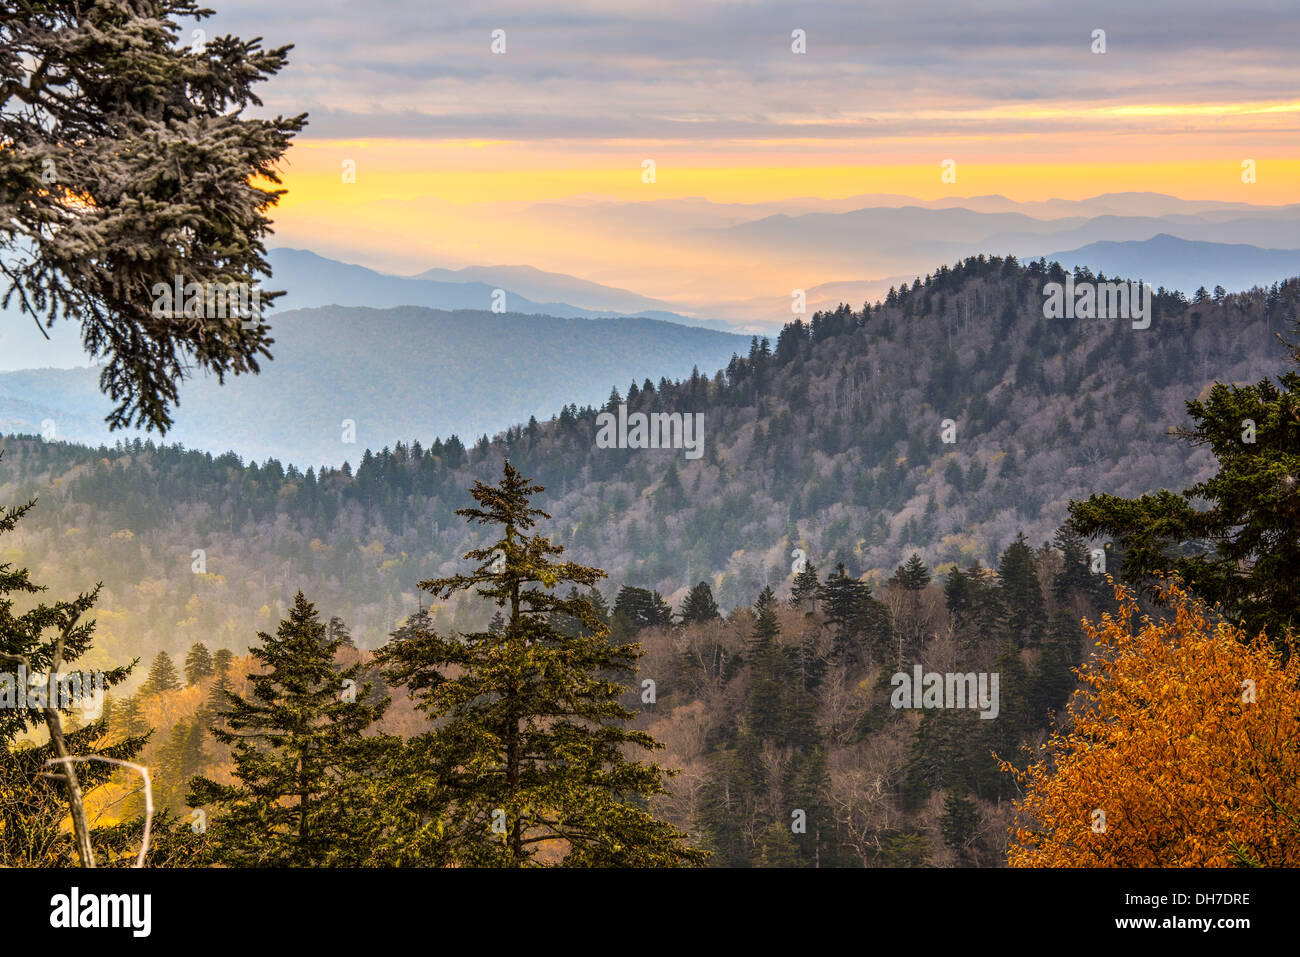 Herbstmorgen in der Smoky Mountains National Park. Stockbild